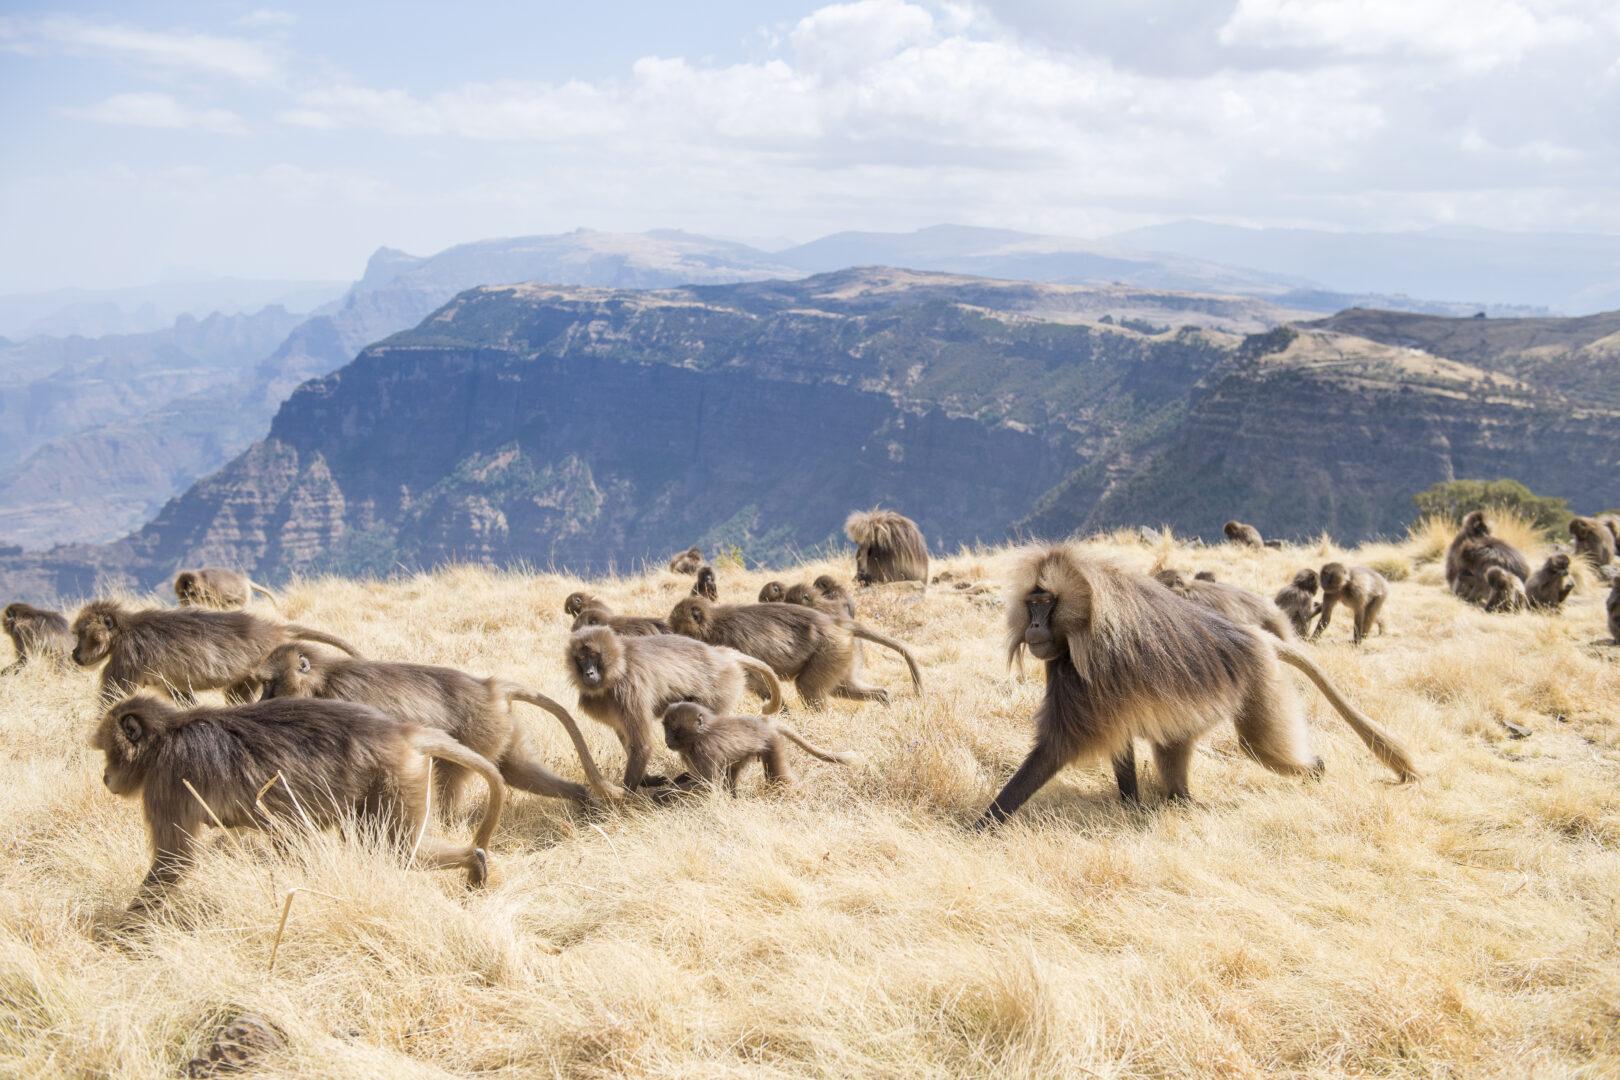 Gelada Baboons in Semien Mountains National Park, Ethiopia